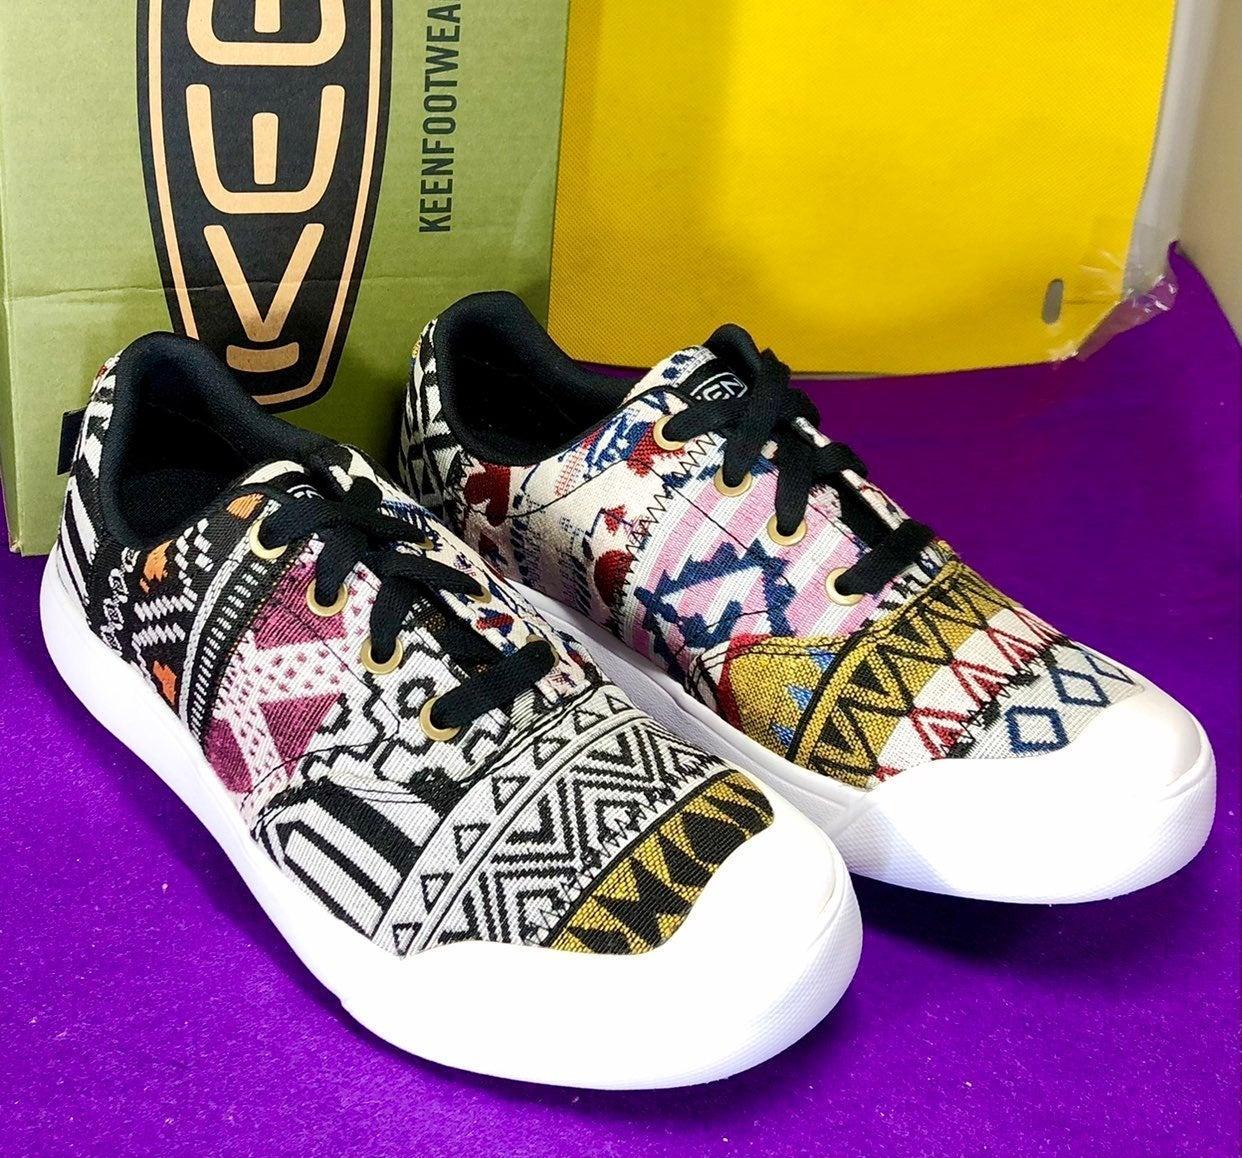 KEEN Women's Elena Oxford Shoes Size 5.5